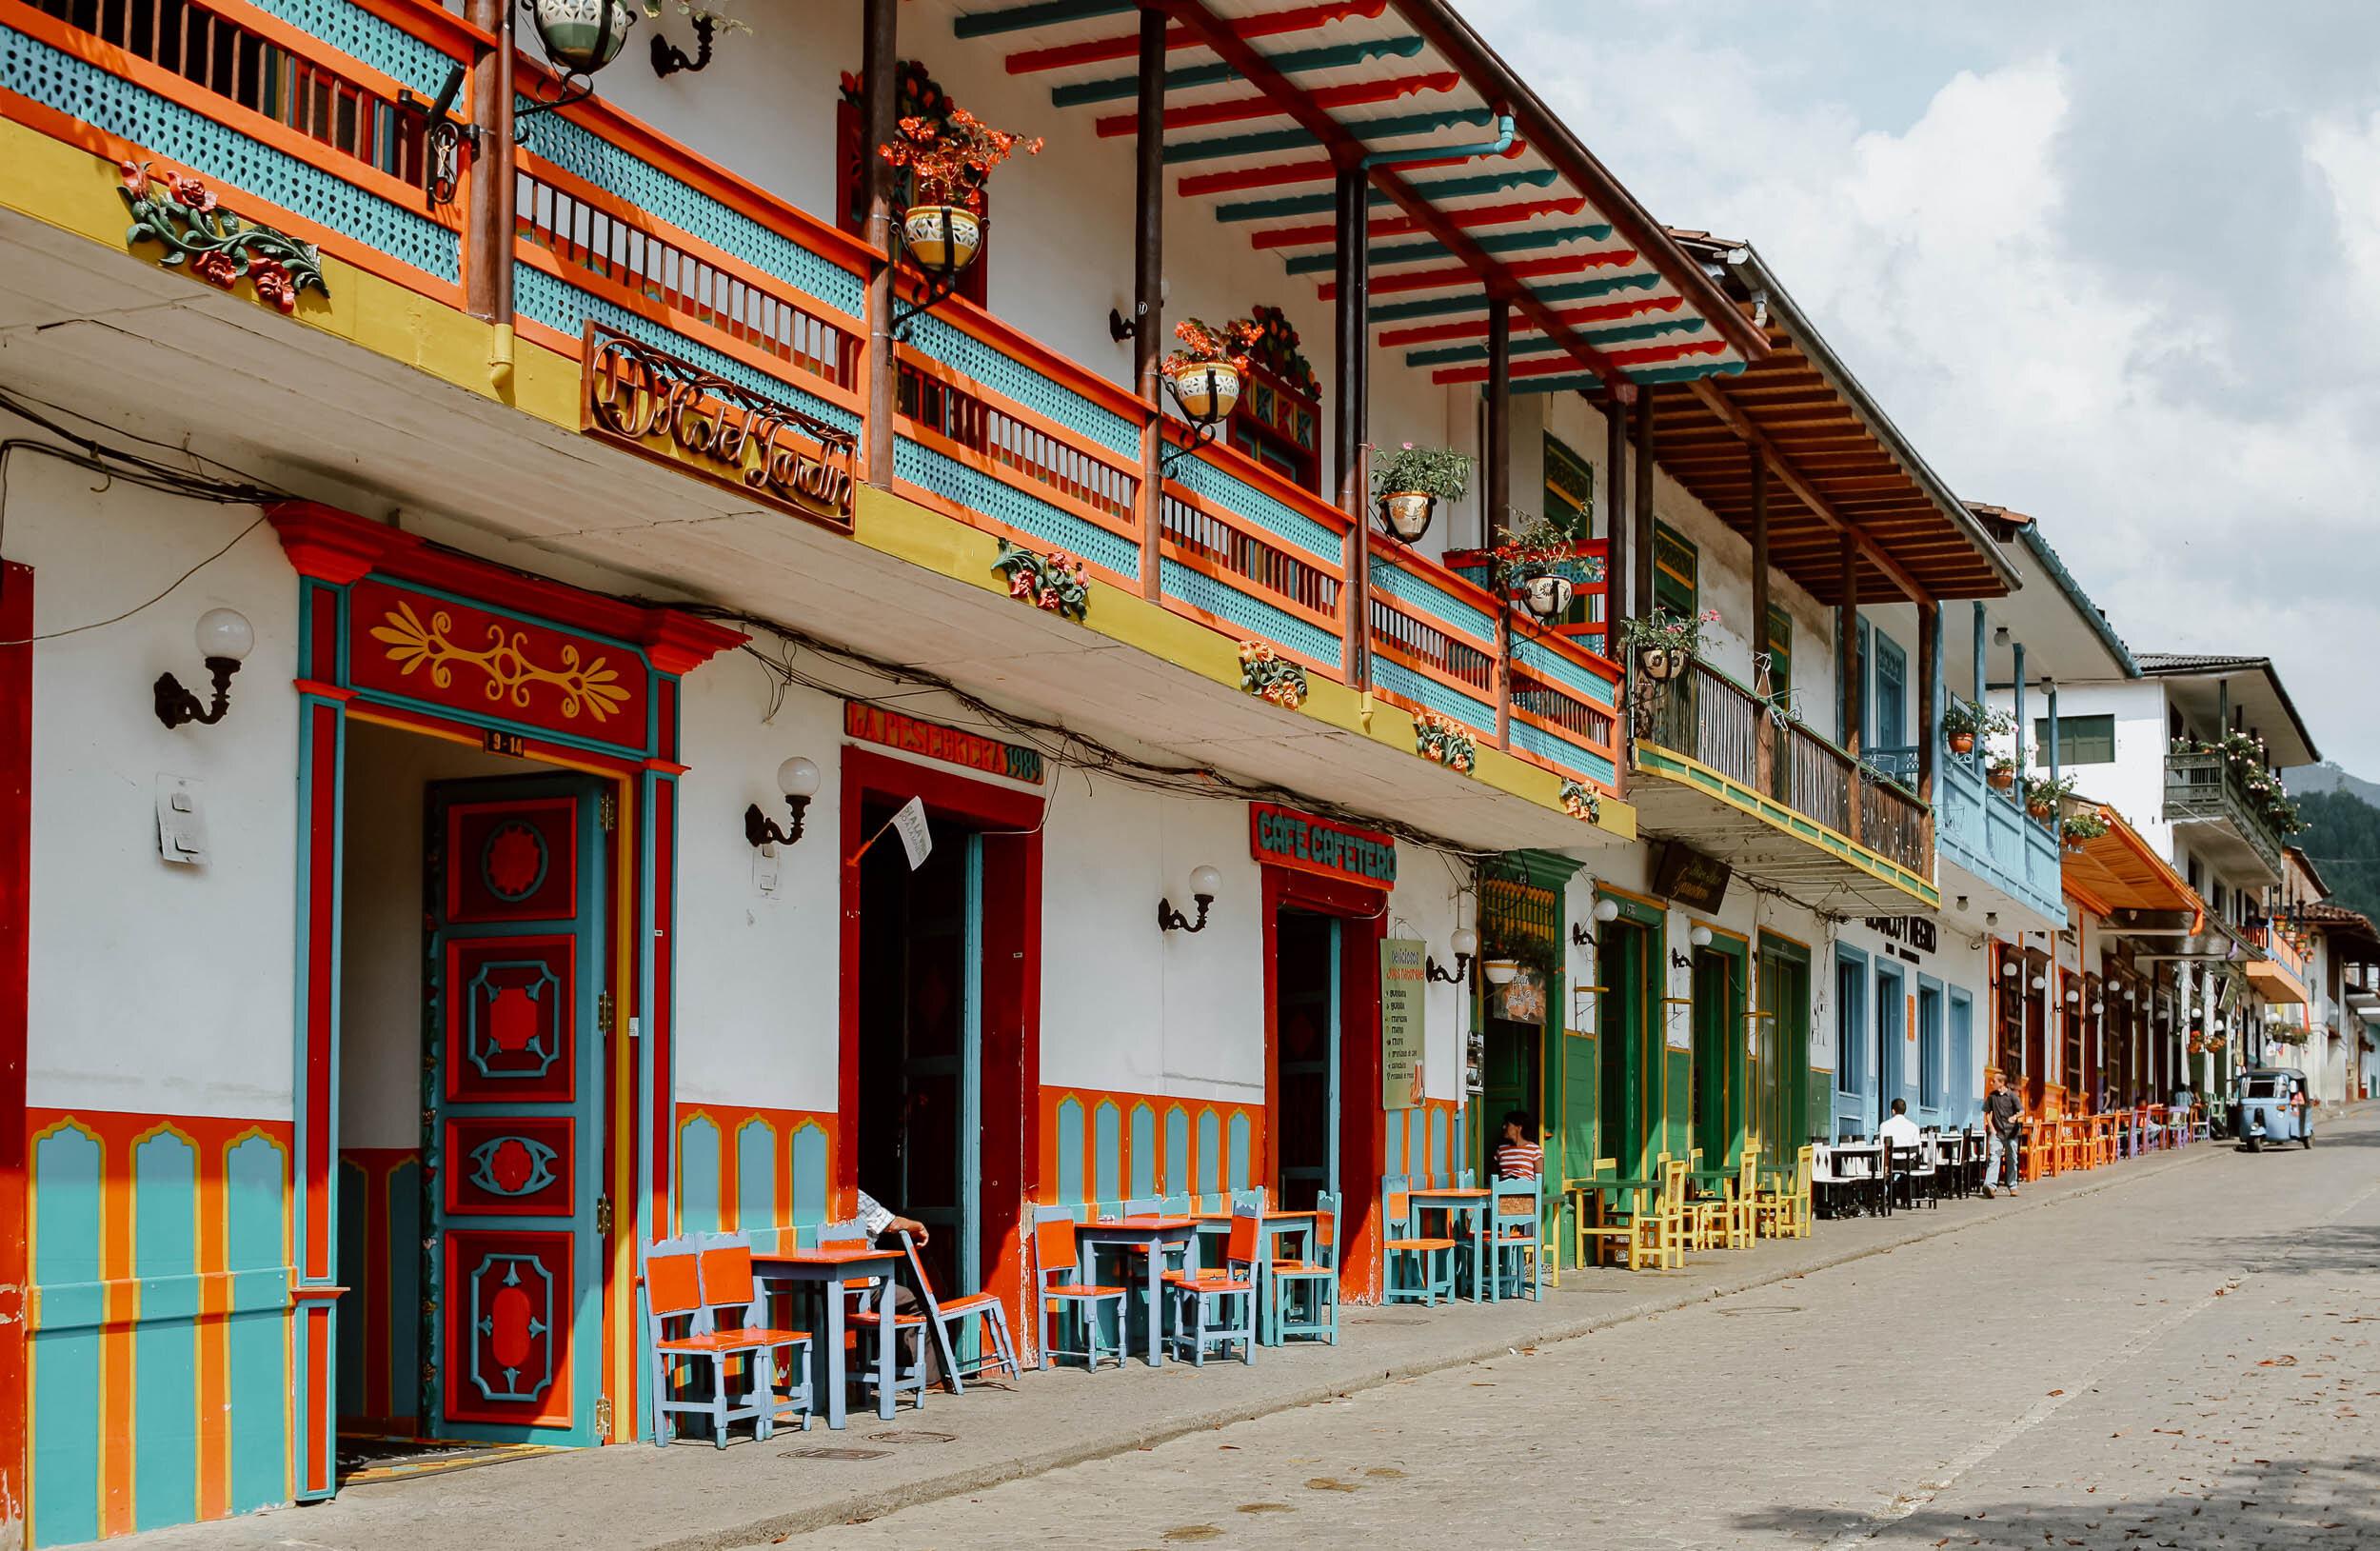 Jardin Our Favourite Town In Colombia Along Dusty Roads